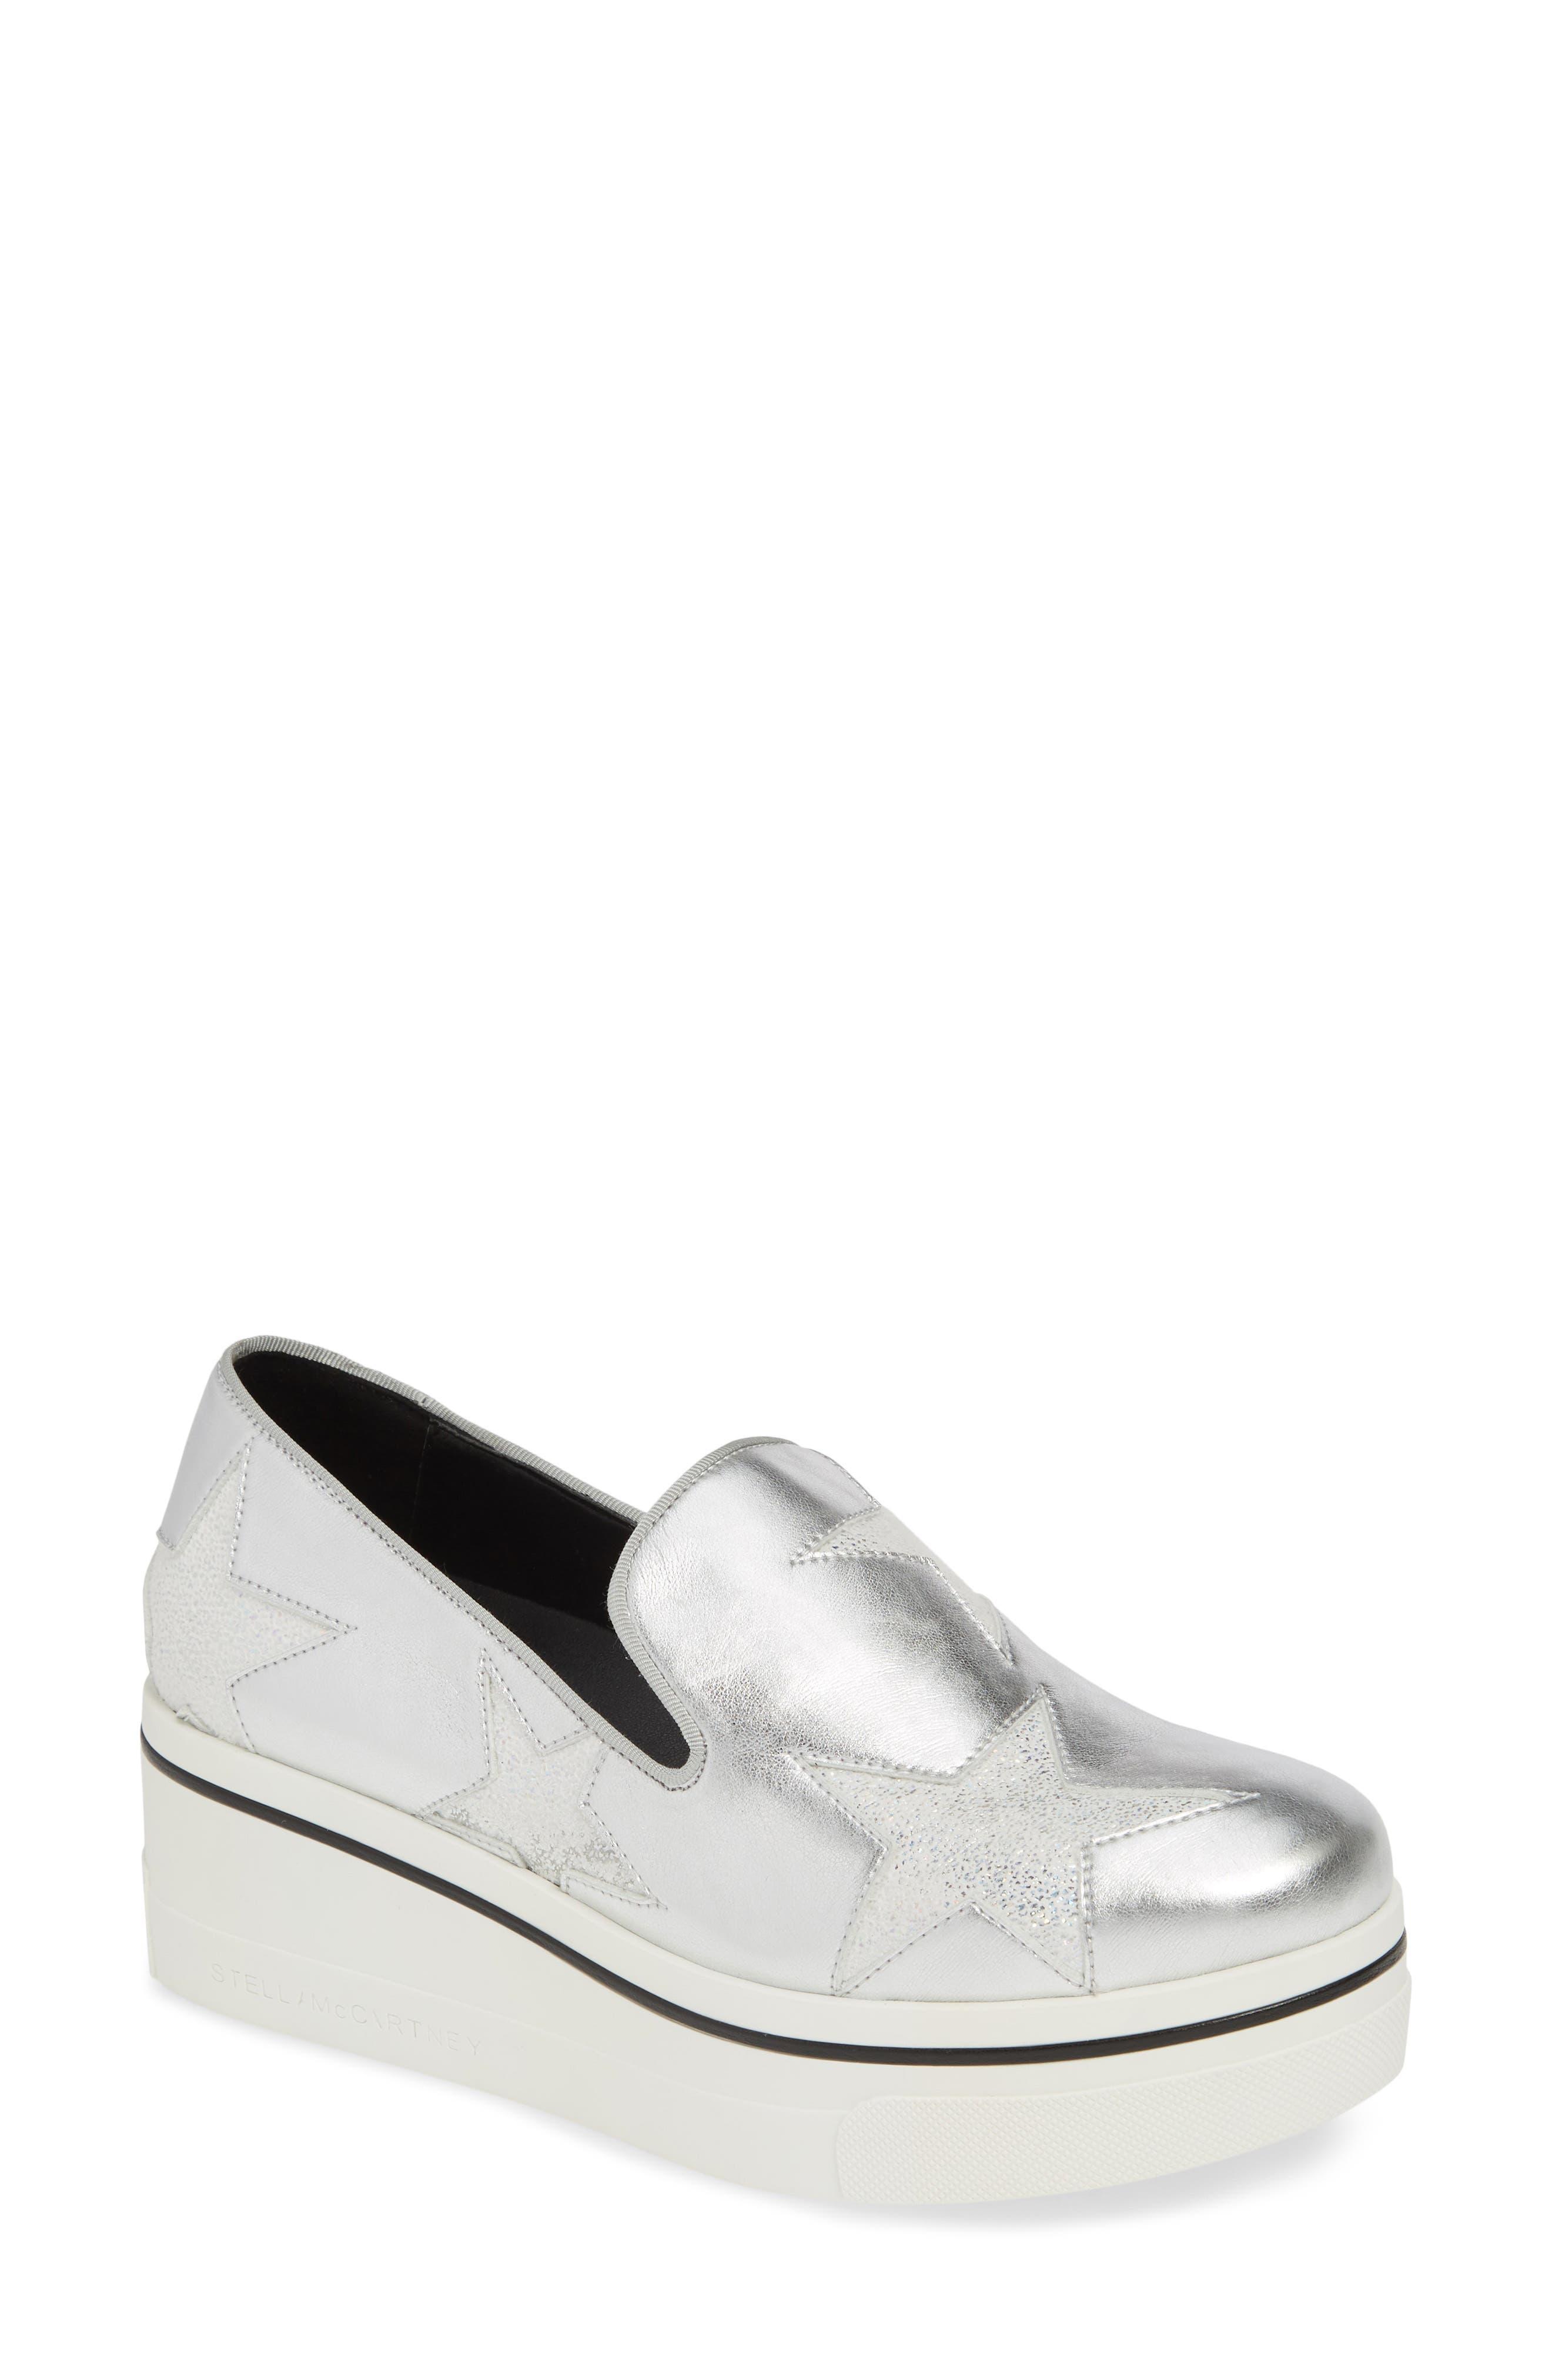 d623190274e Stella McCartney Women s Shoes